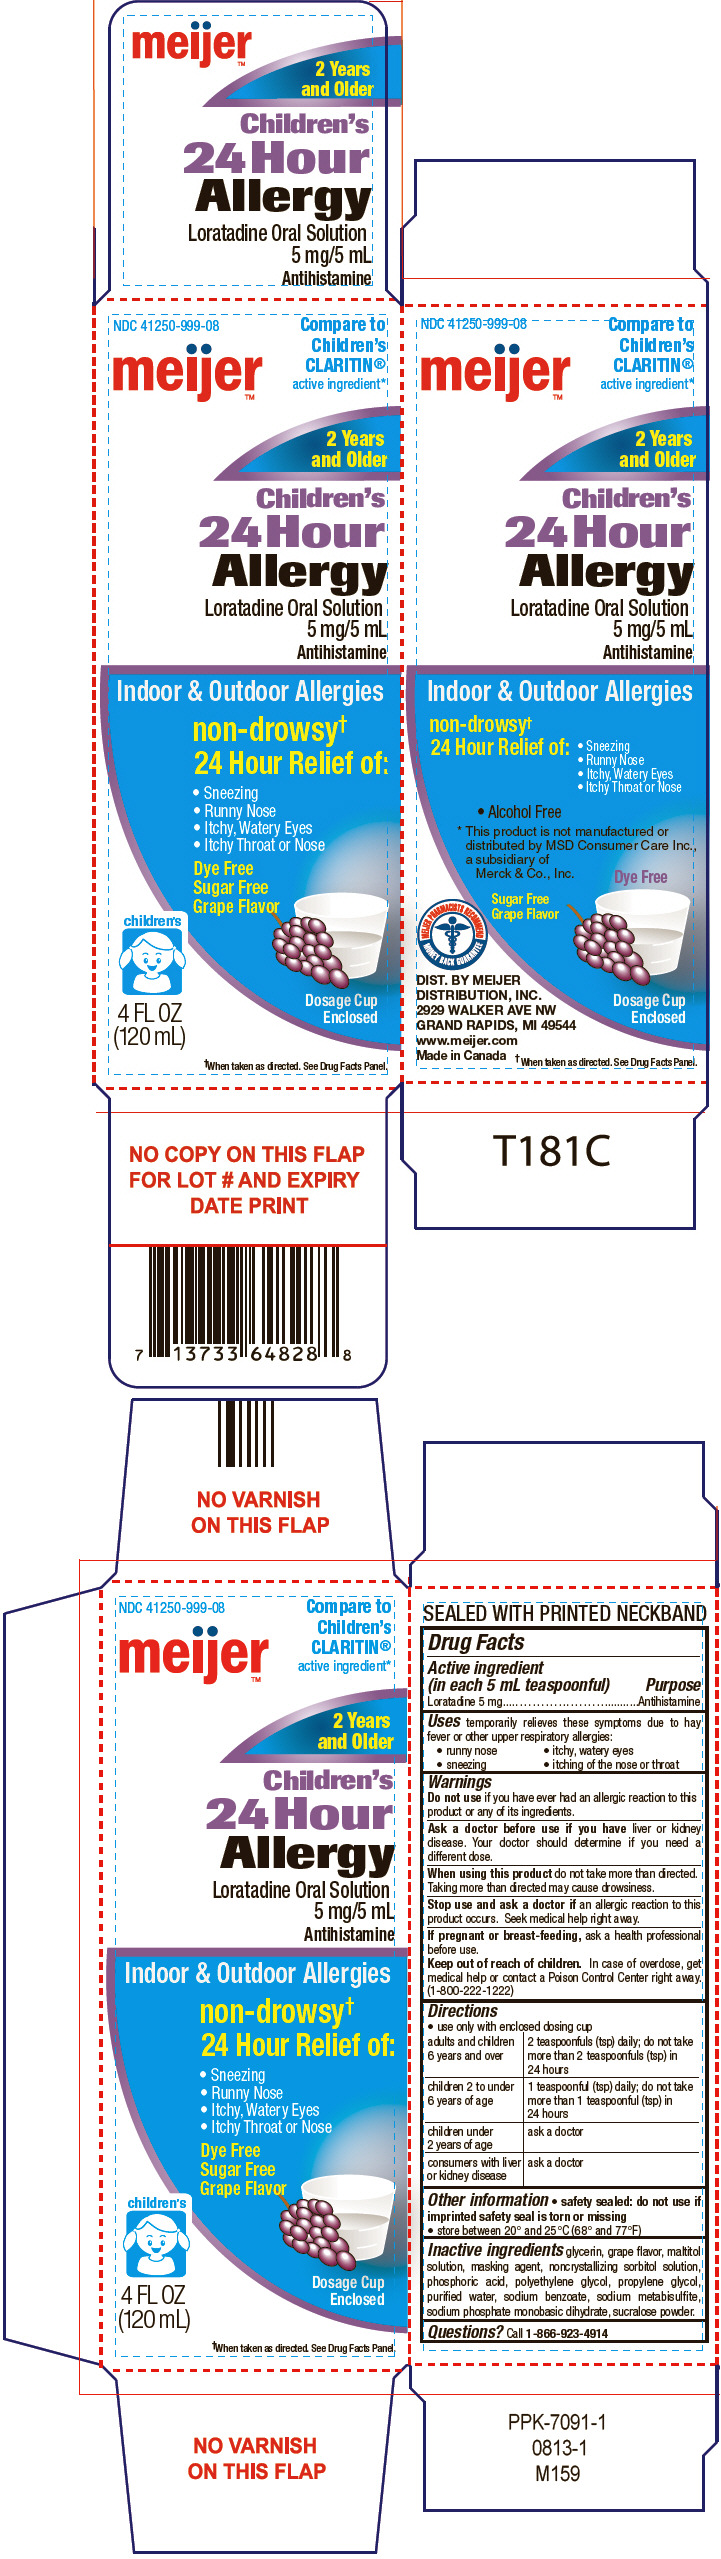 Meijer Childrens 24 Hour Allergy (Loratadine) Solution [Meijer Distribution Inc]